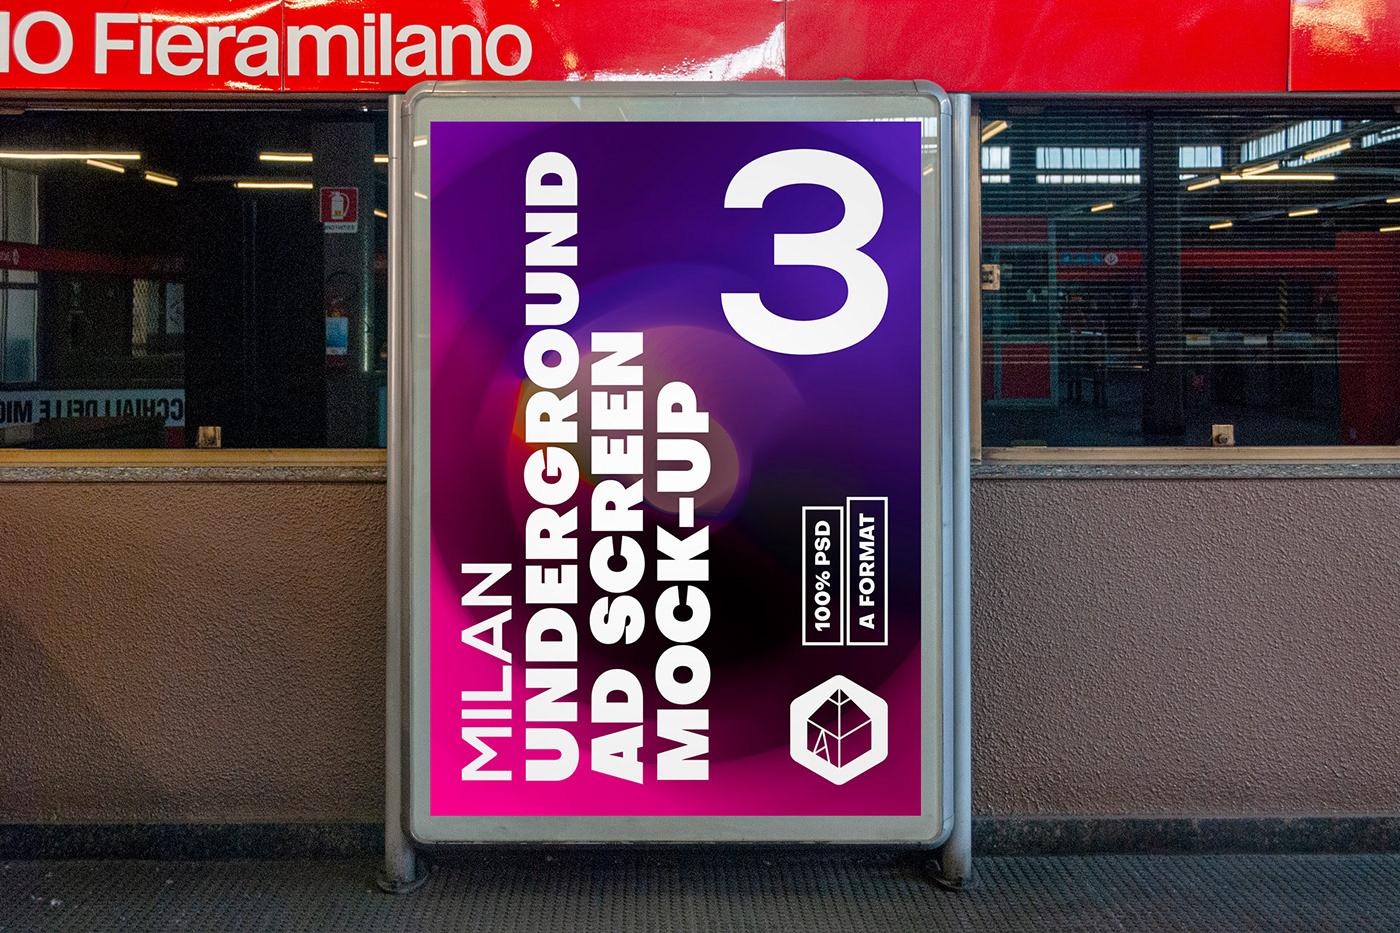 ad Advertising  metro milan mock-up Mockup poster screen STATION underground